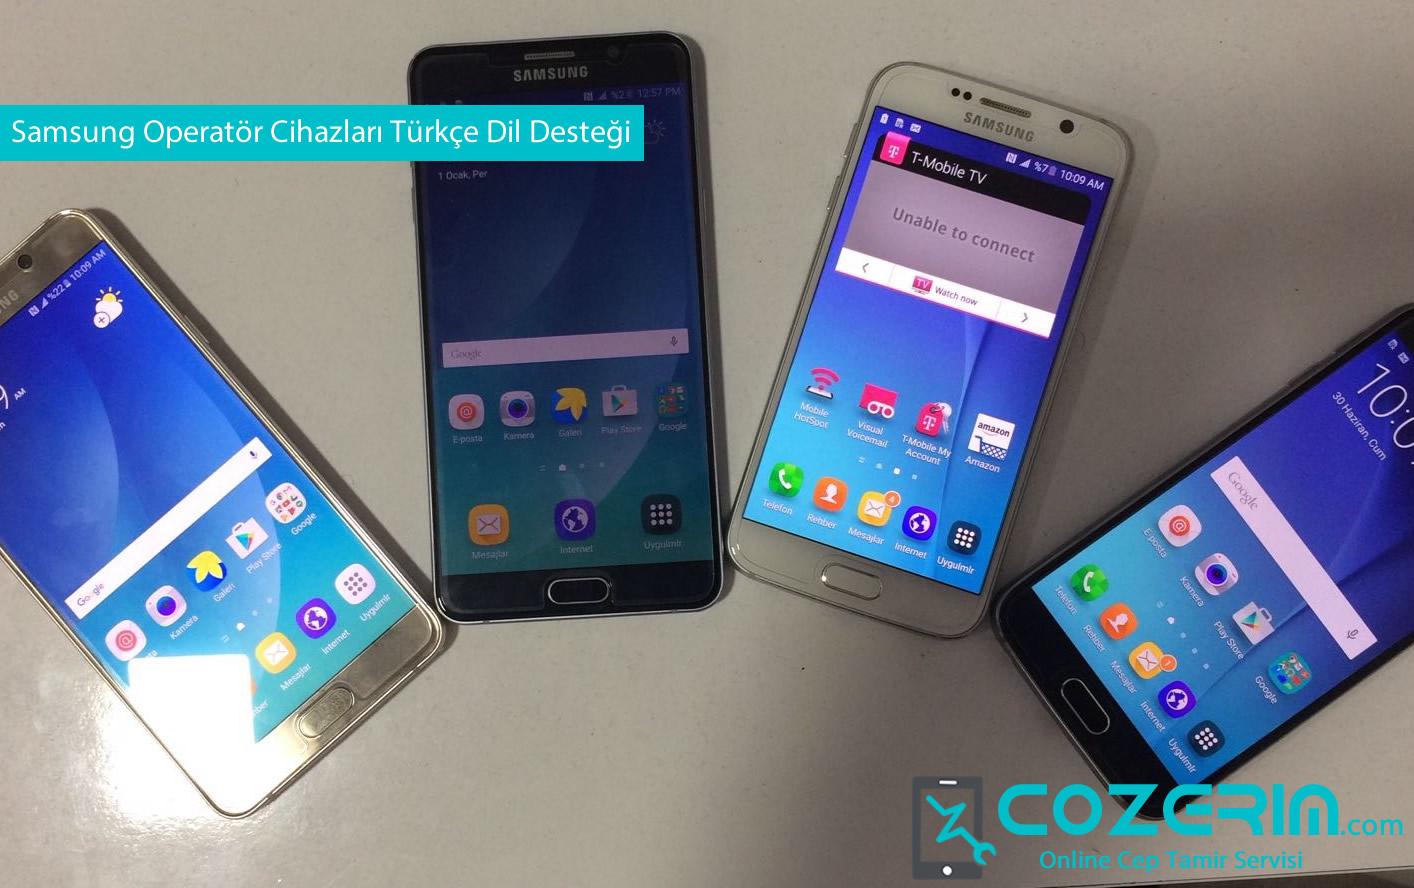 Samsung operator cihazlari turkce dil destegi